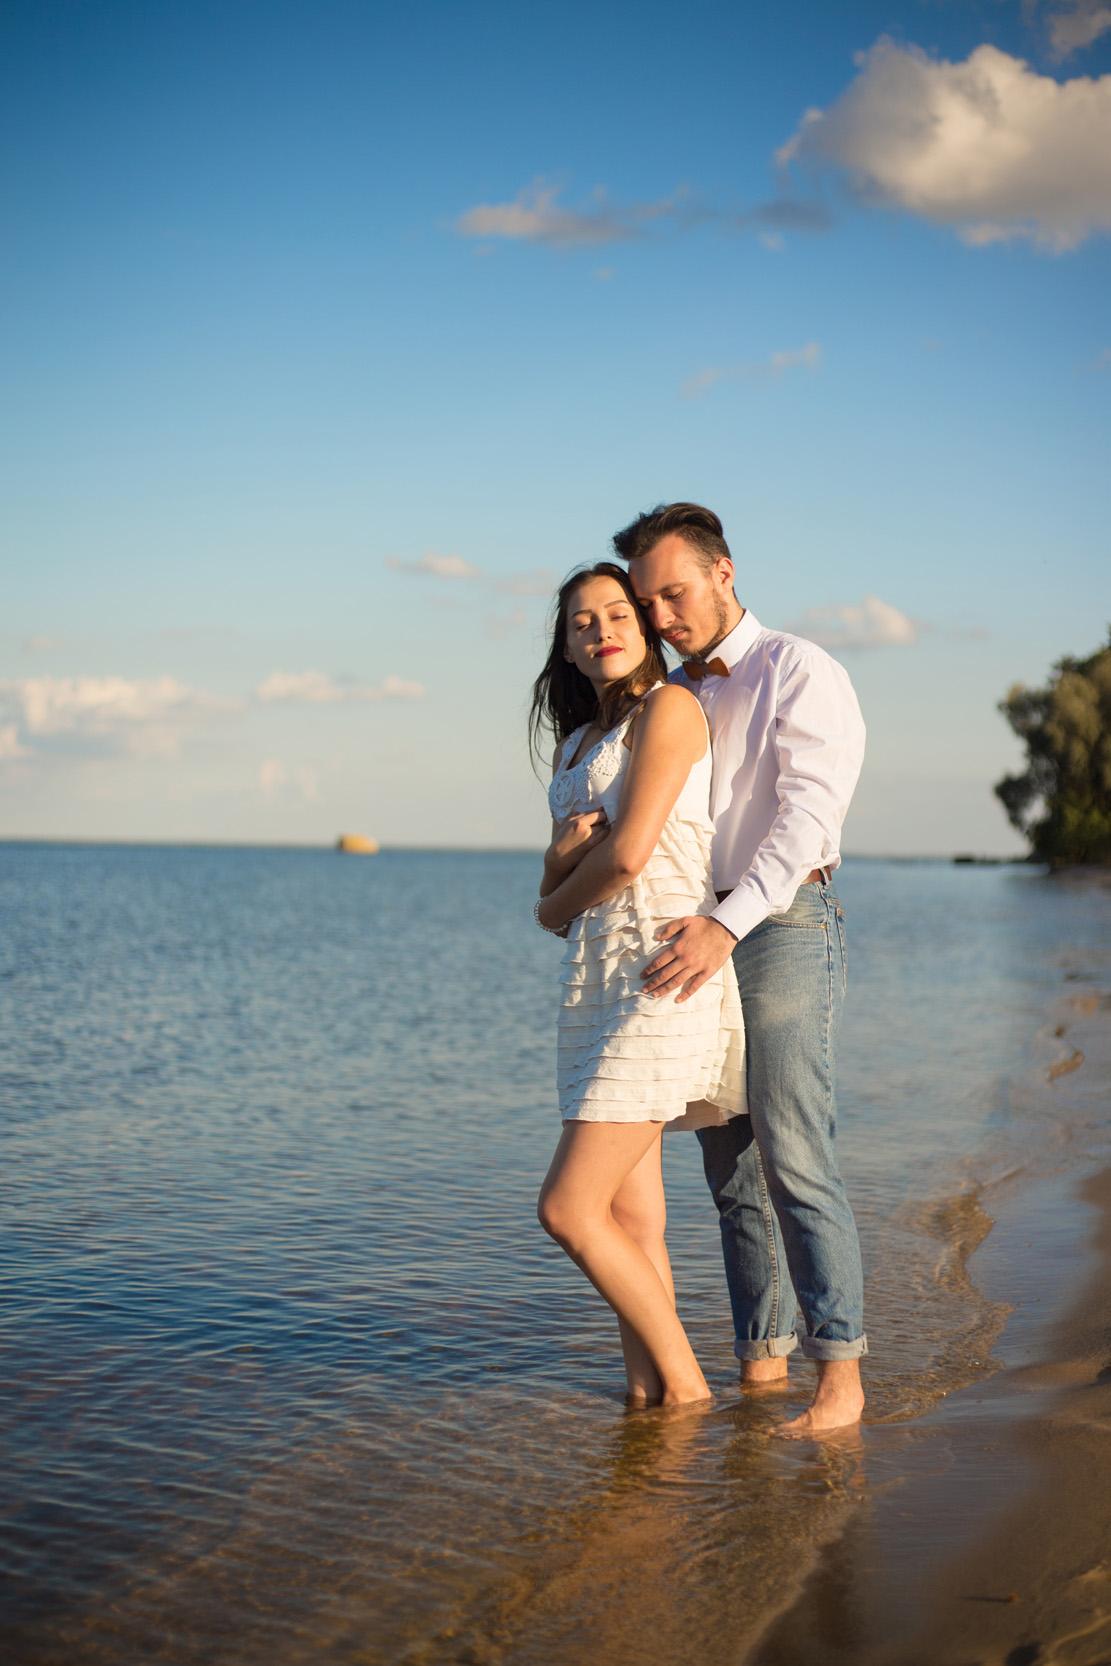 Пара на берегу моря, фотосеесия на берегу